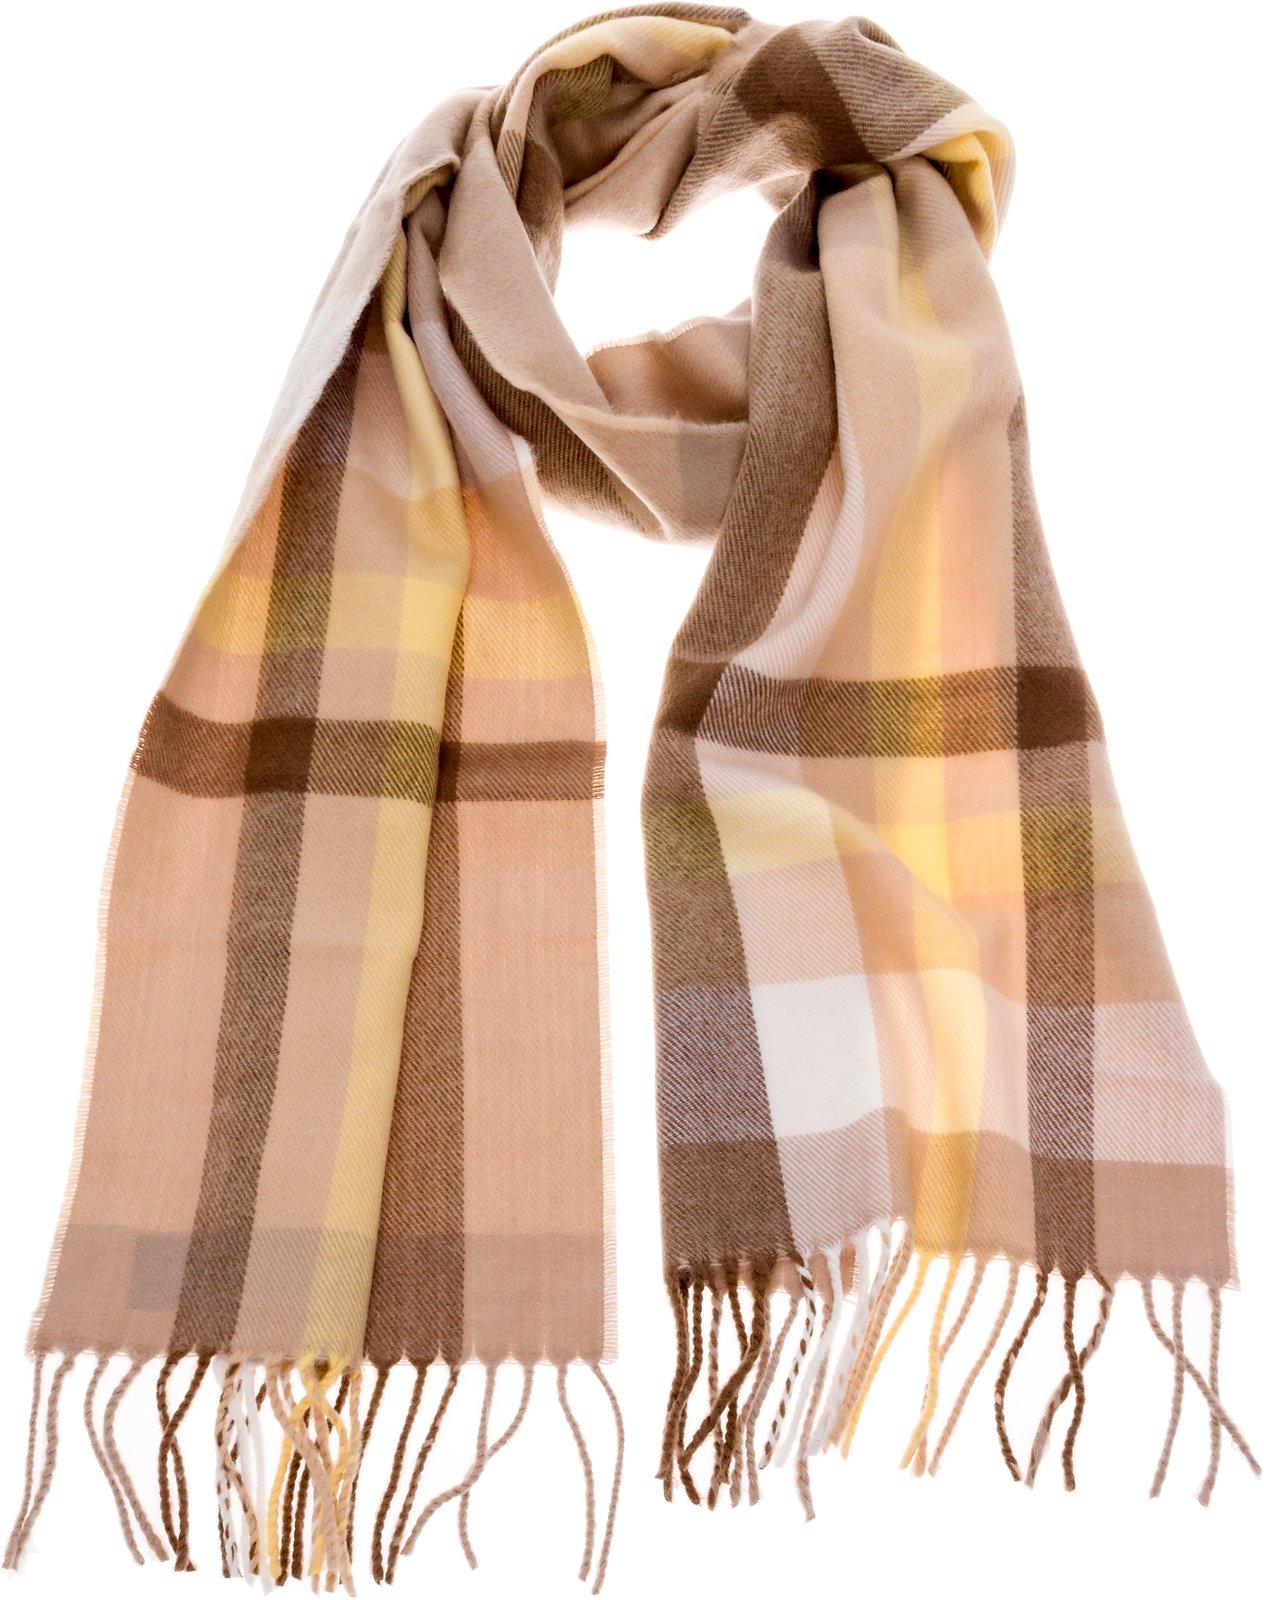 SilverHooks Soft & Warm Plaid Cashmere Scarf w/Gift Box (Cream, Yellow & Brown)